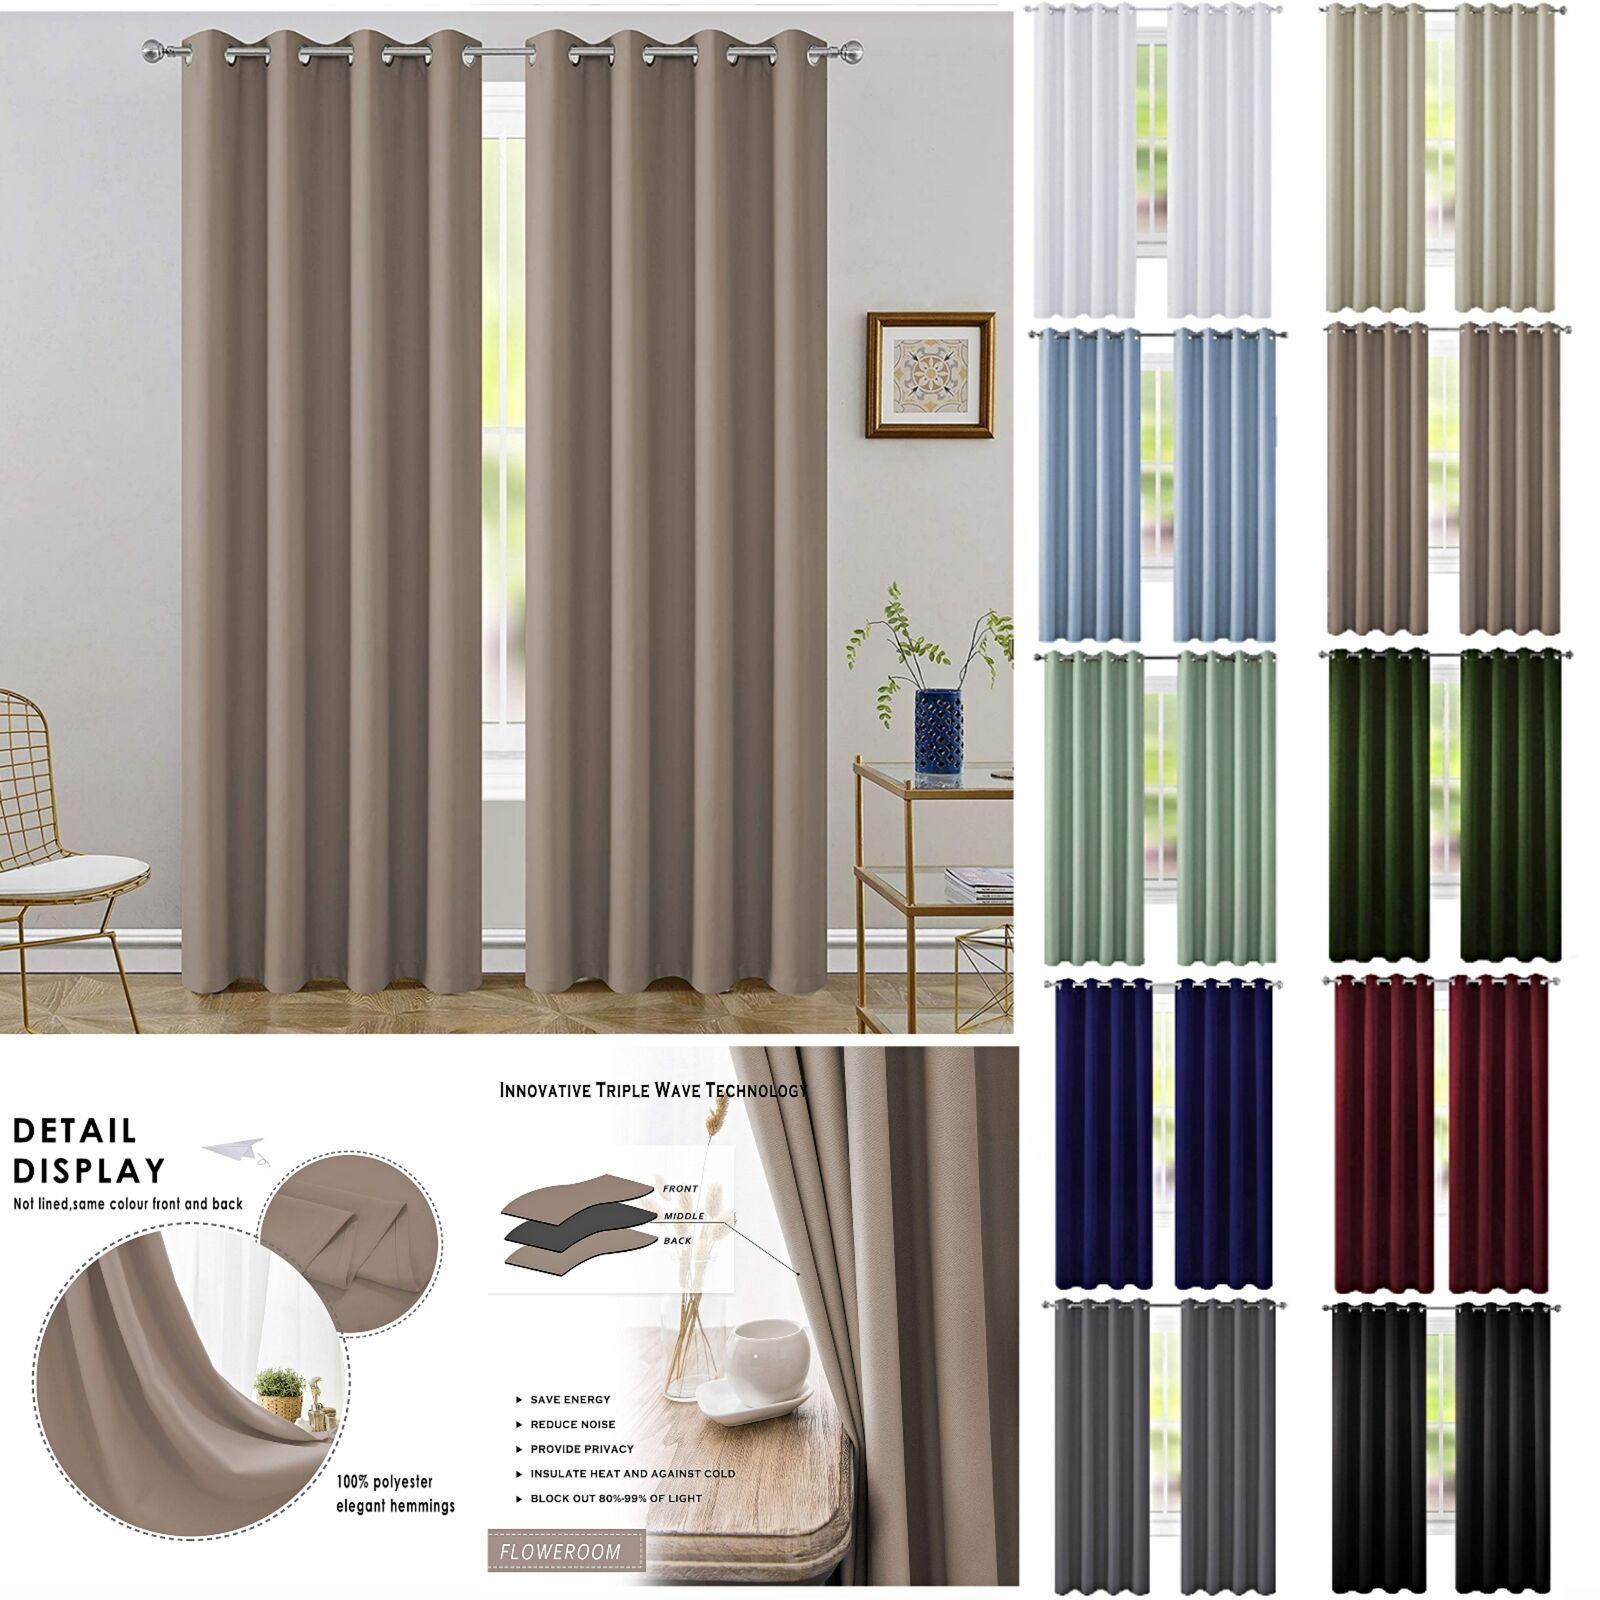 2 Panels Blackout Window Curtains Drape Room Darkening Grommet